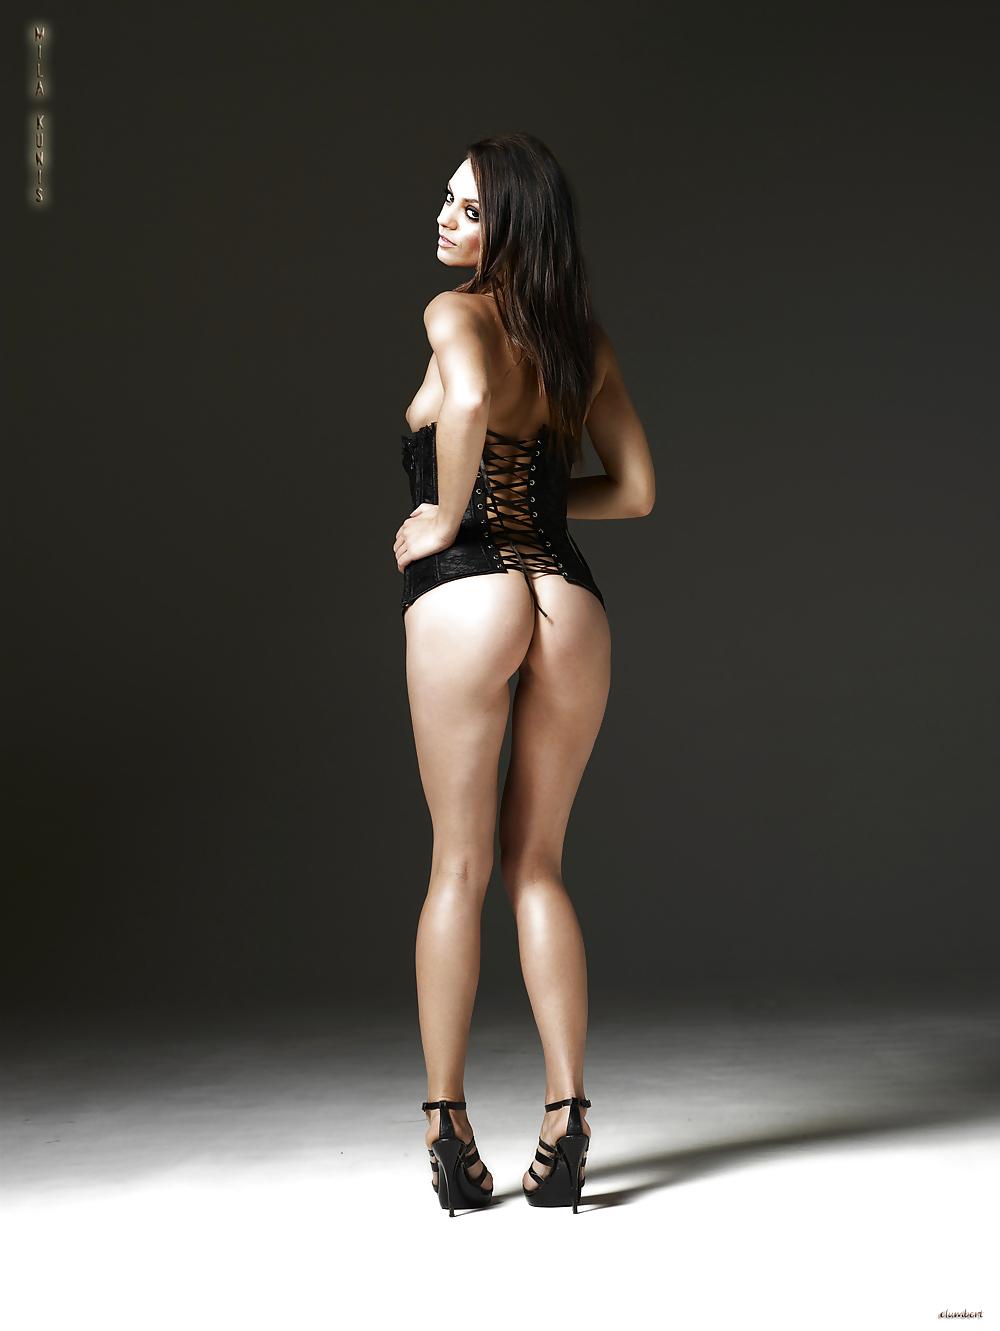 Sex Mila Kunis Hot Nude Pics HD